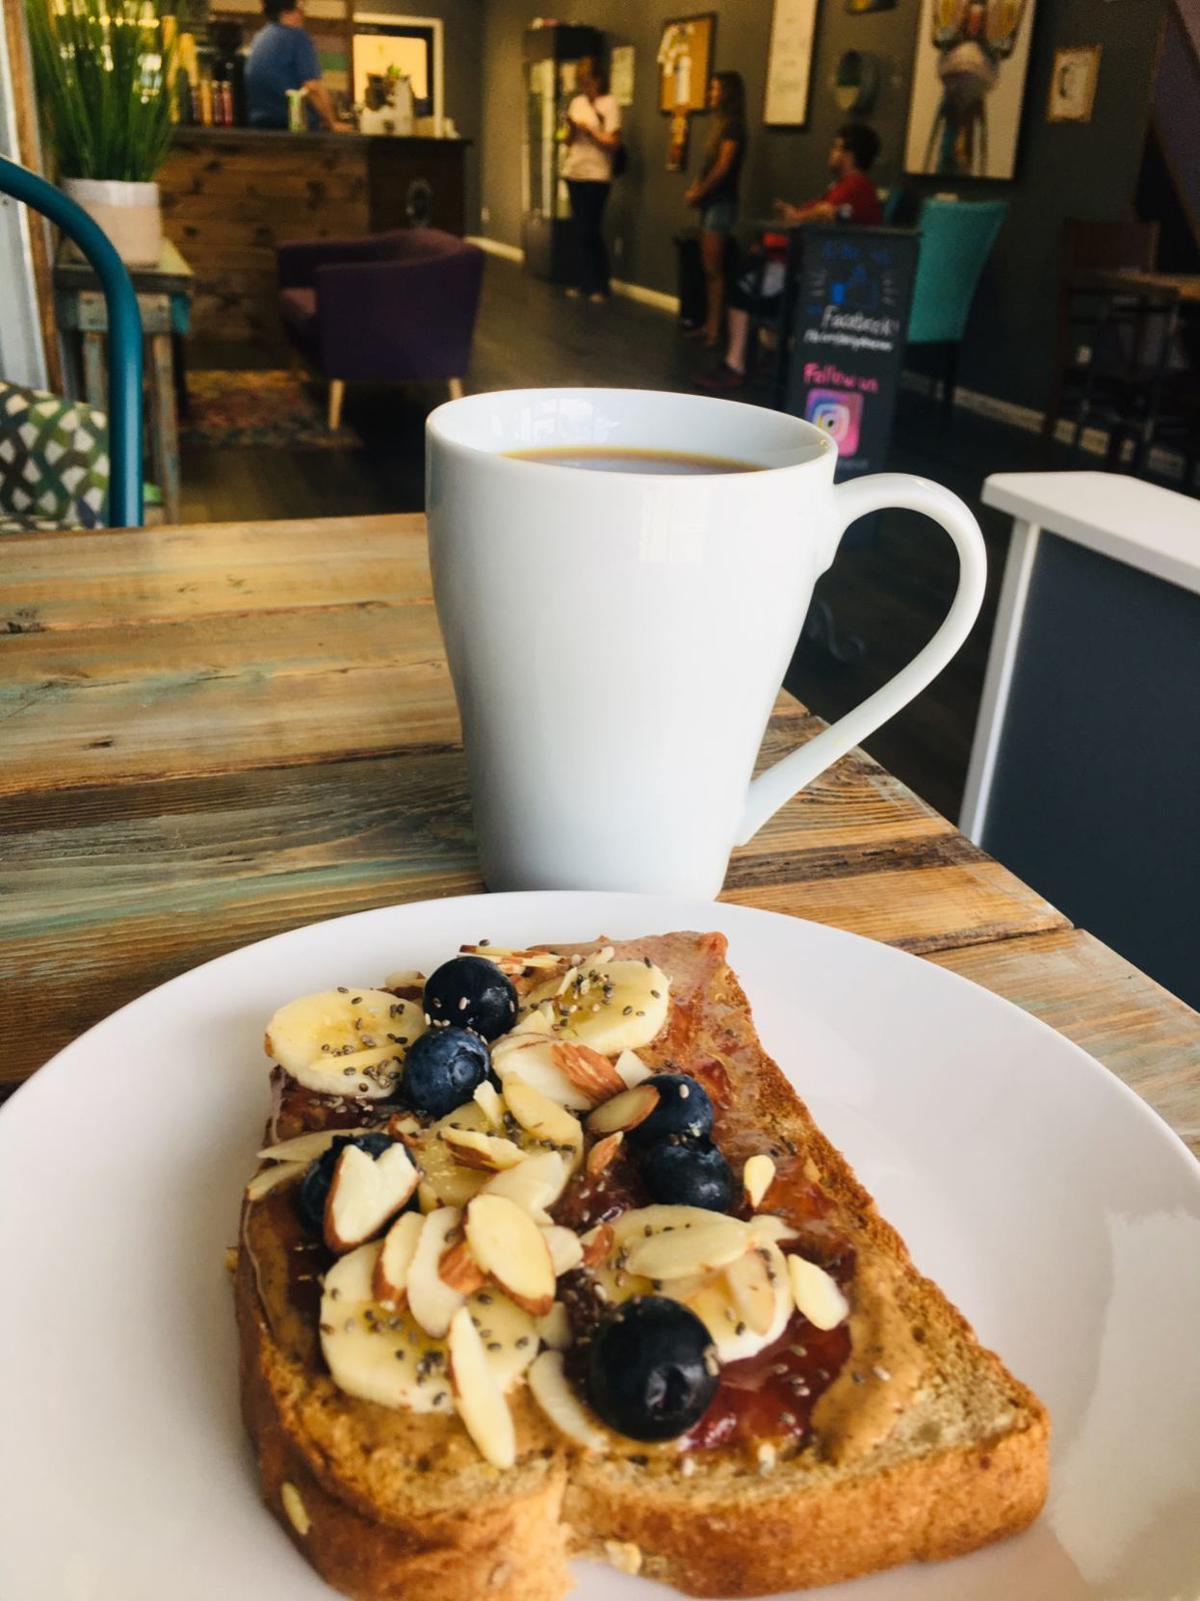 20190821-gm-foodguy-pbjwcoffee.jpg